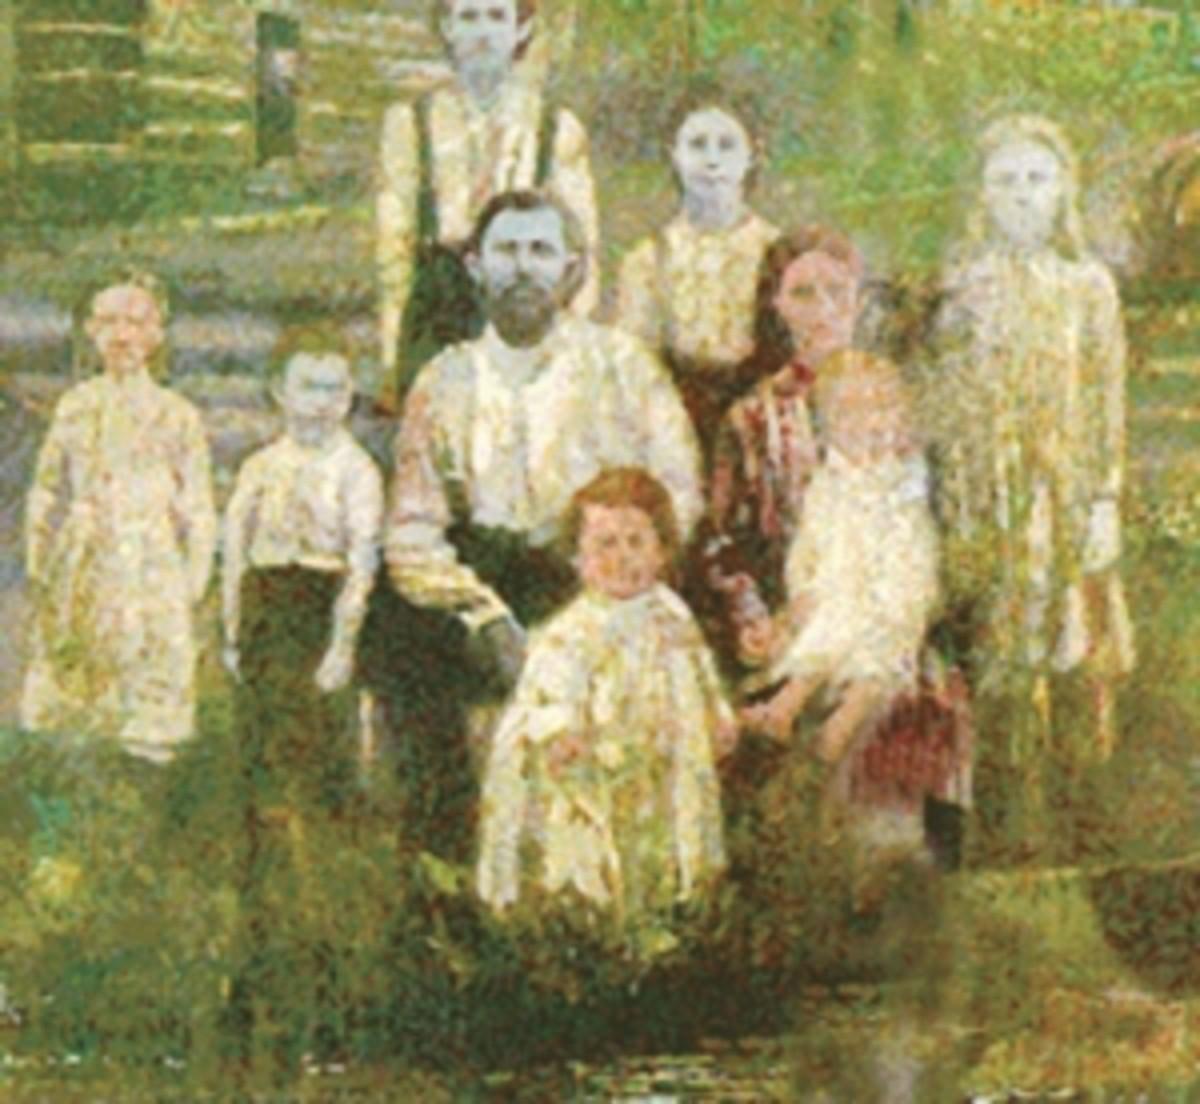 The Fugate family of Hazard, Kentucky